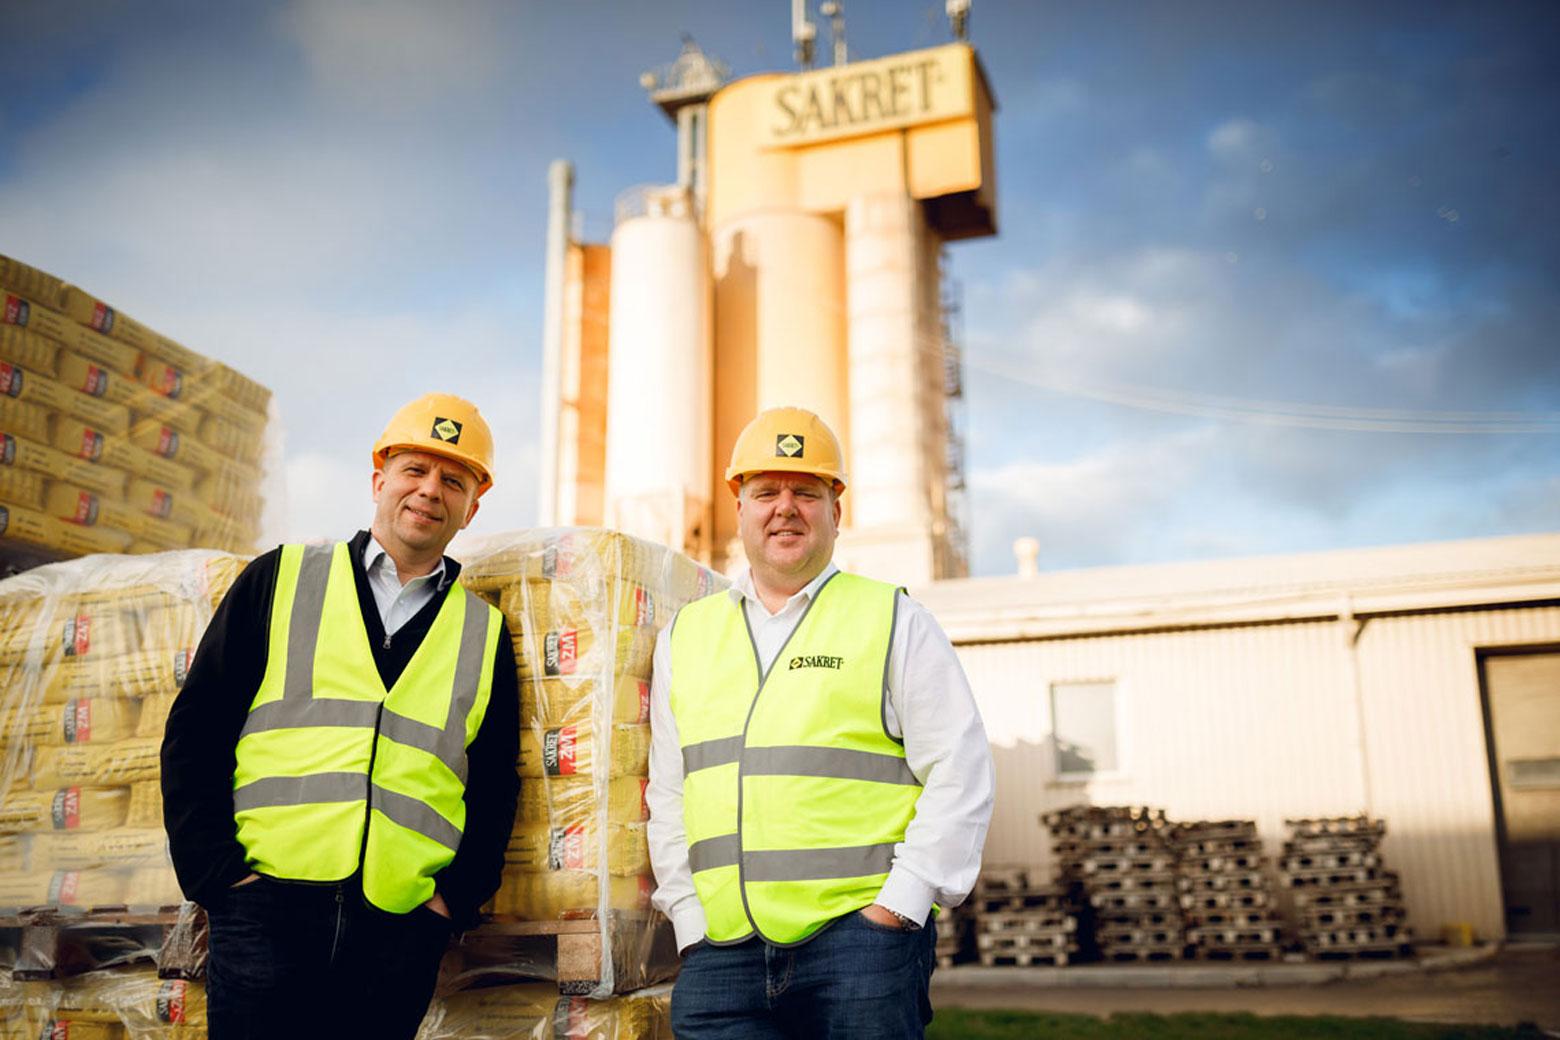 Juris Grinvalds (l.), Geschäftsführer und Andris Vanags (r.), Präsident der JSC SAKRET Holdings